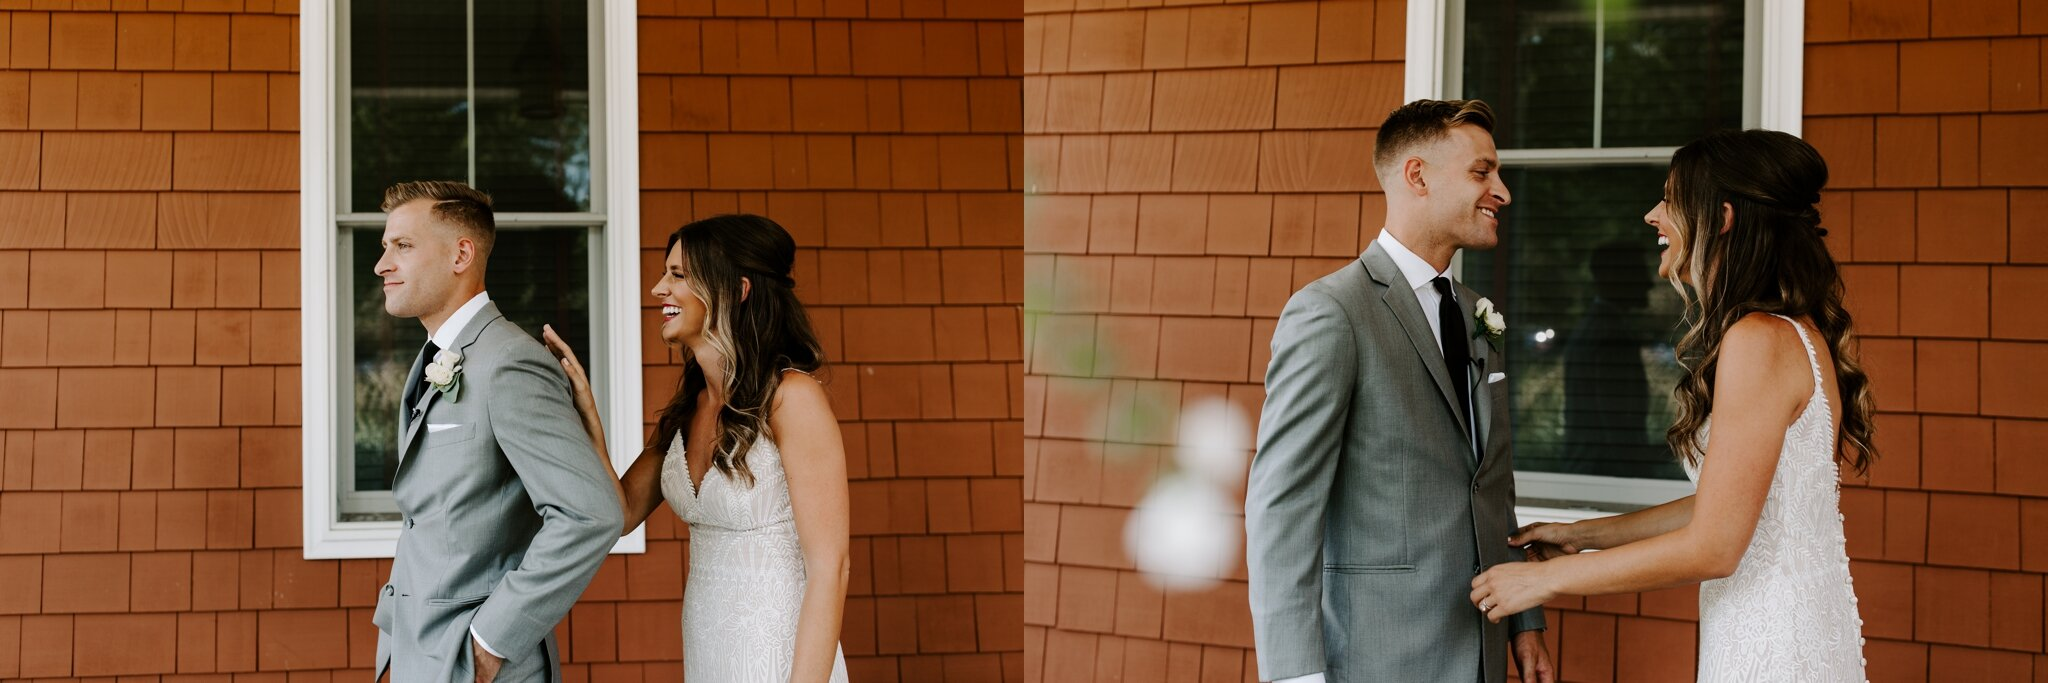 asheville-north-carolina-wedding-photographer_2682.jpg